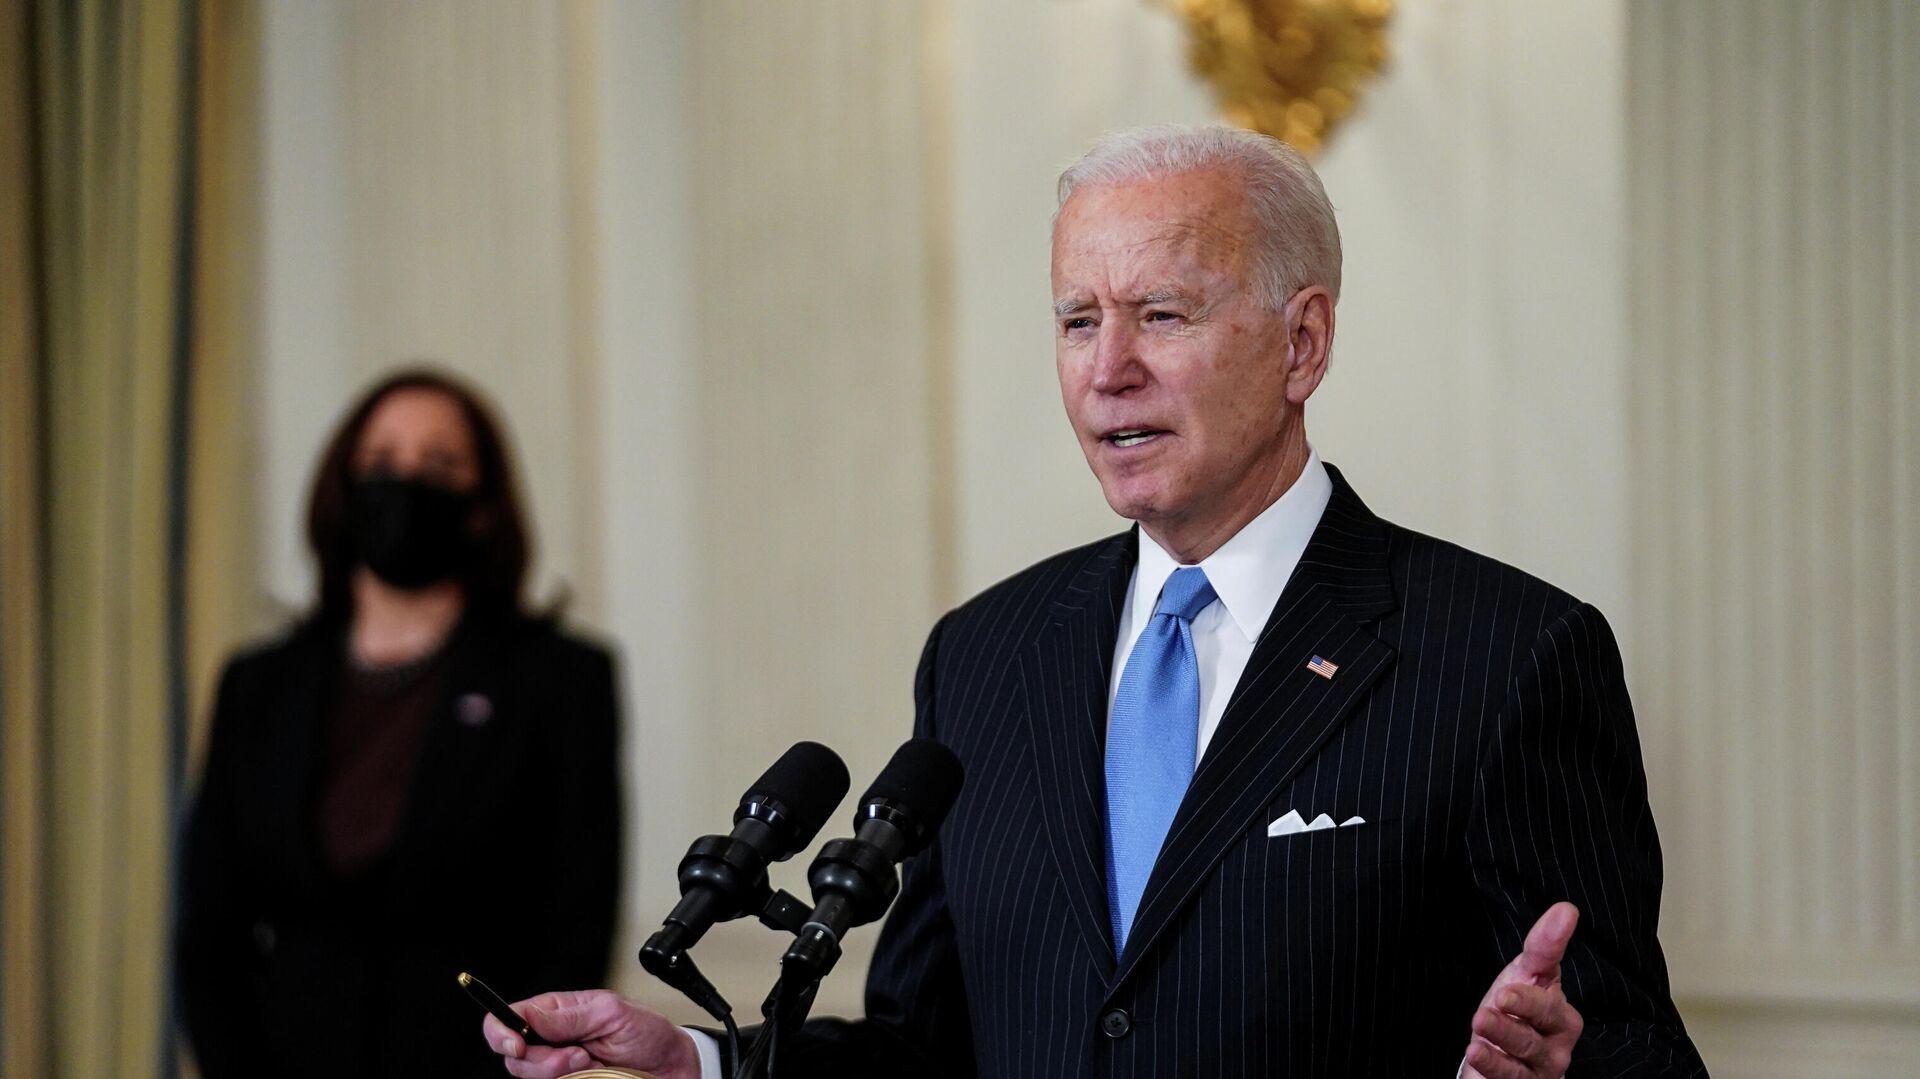 Joe Biden, presidente de EEUU - Sputnik Mundo, 1920, 18.03.2021